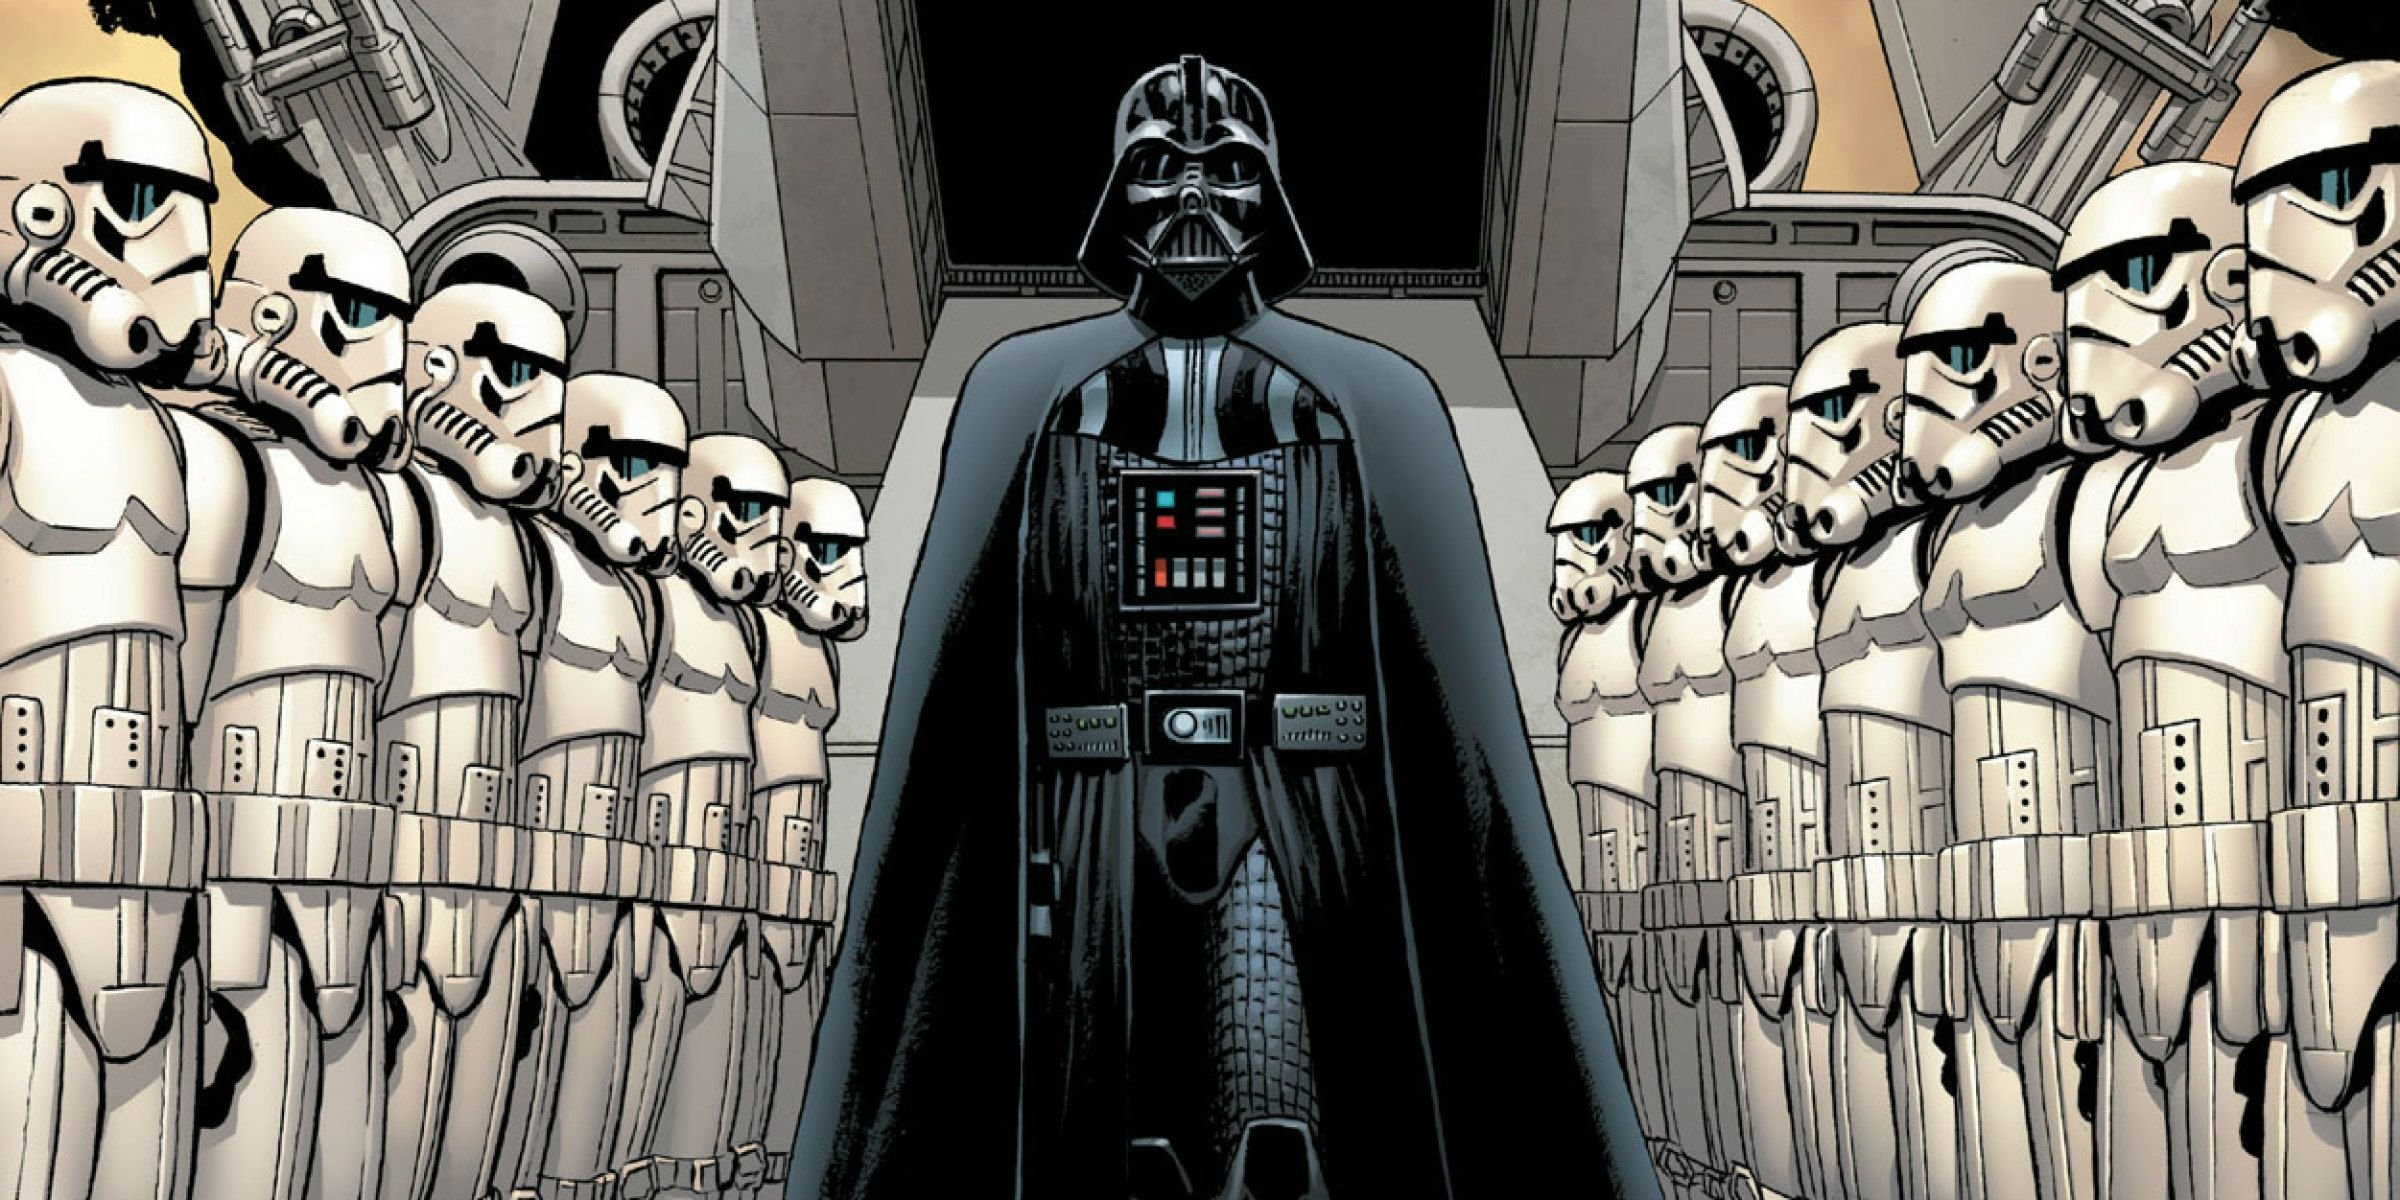 Star wars lightsabers darth vader wallpaper. . 1920×1200. . STAR WARS  FORCE AWAKENS action adventure futuristic science sci-fi 1star-wars-force